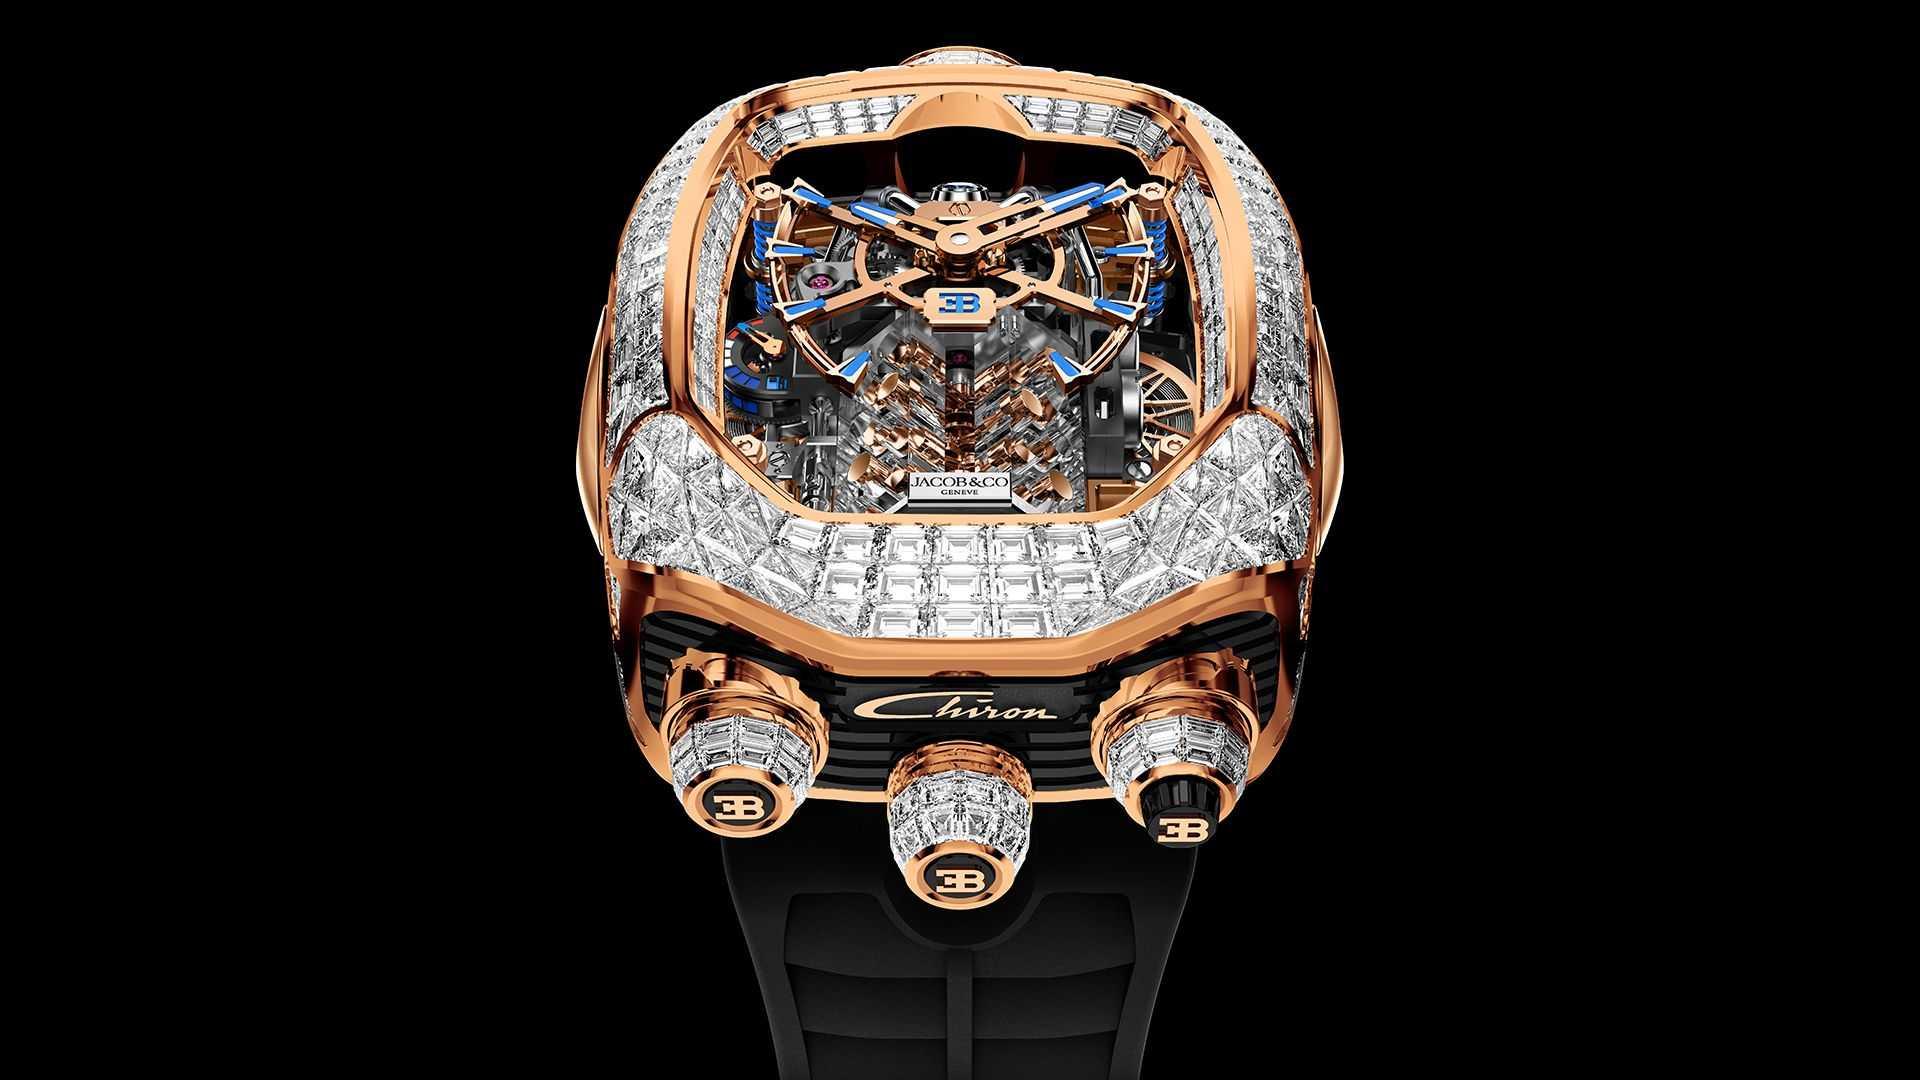 Jacob-Co-Bugatti-Chiron-Tourbillon-Watch-6